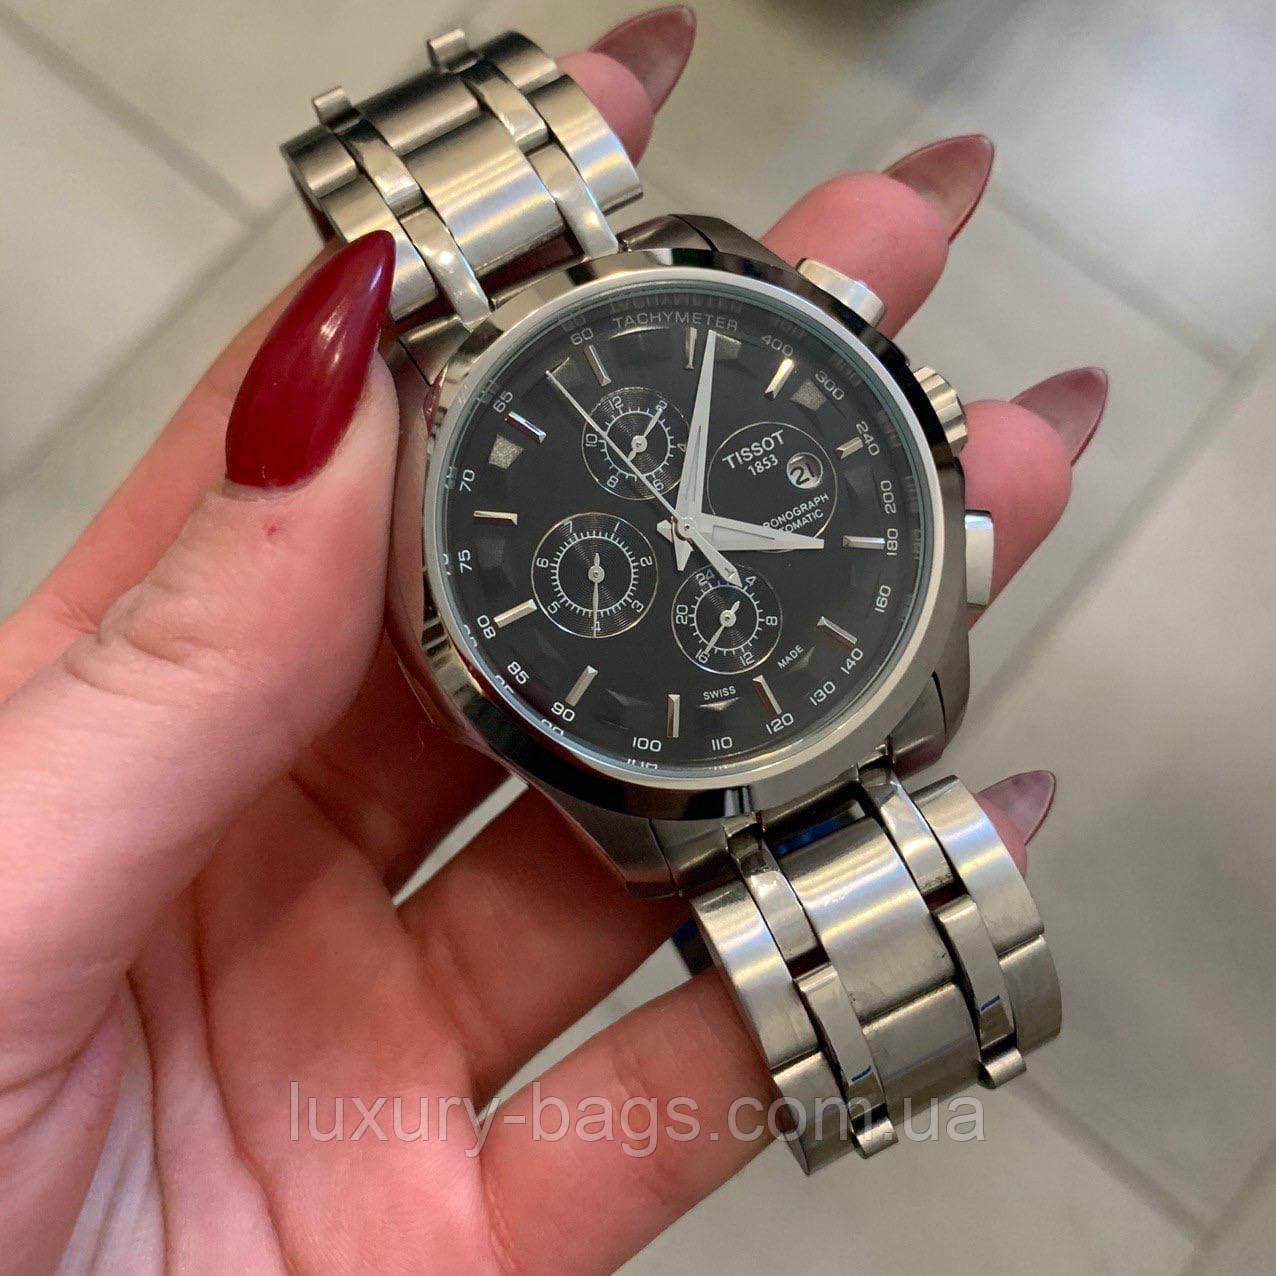 Чоловічі годинники Tissot T-Classic Couturier Chronograph Steel